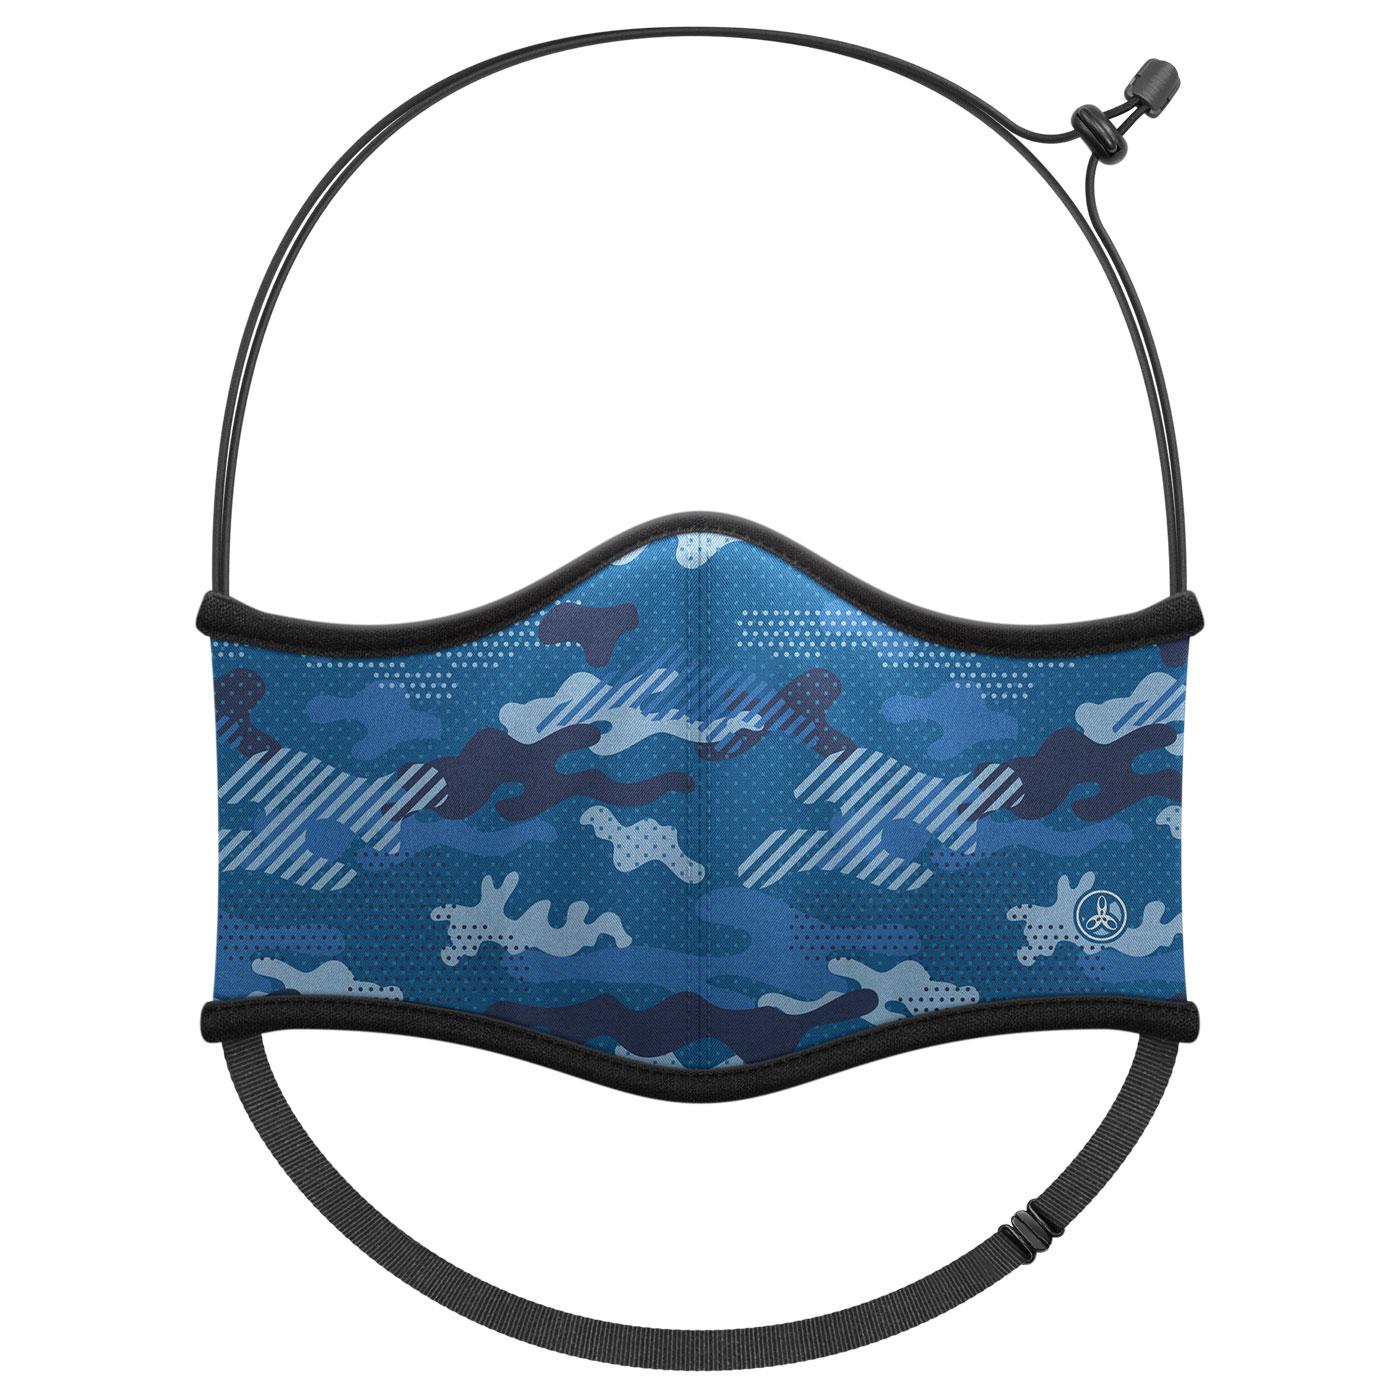 HODARLA 運動舒適口罩6032231 - 迷彩藍